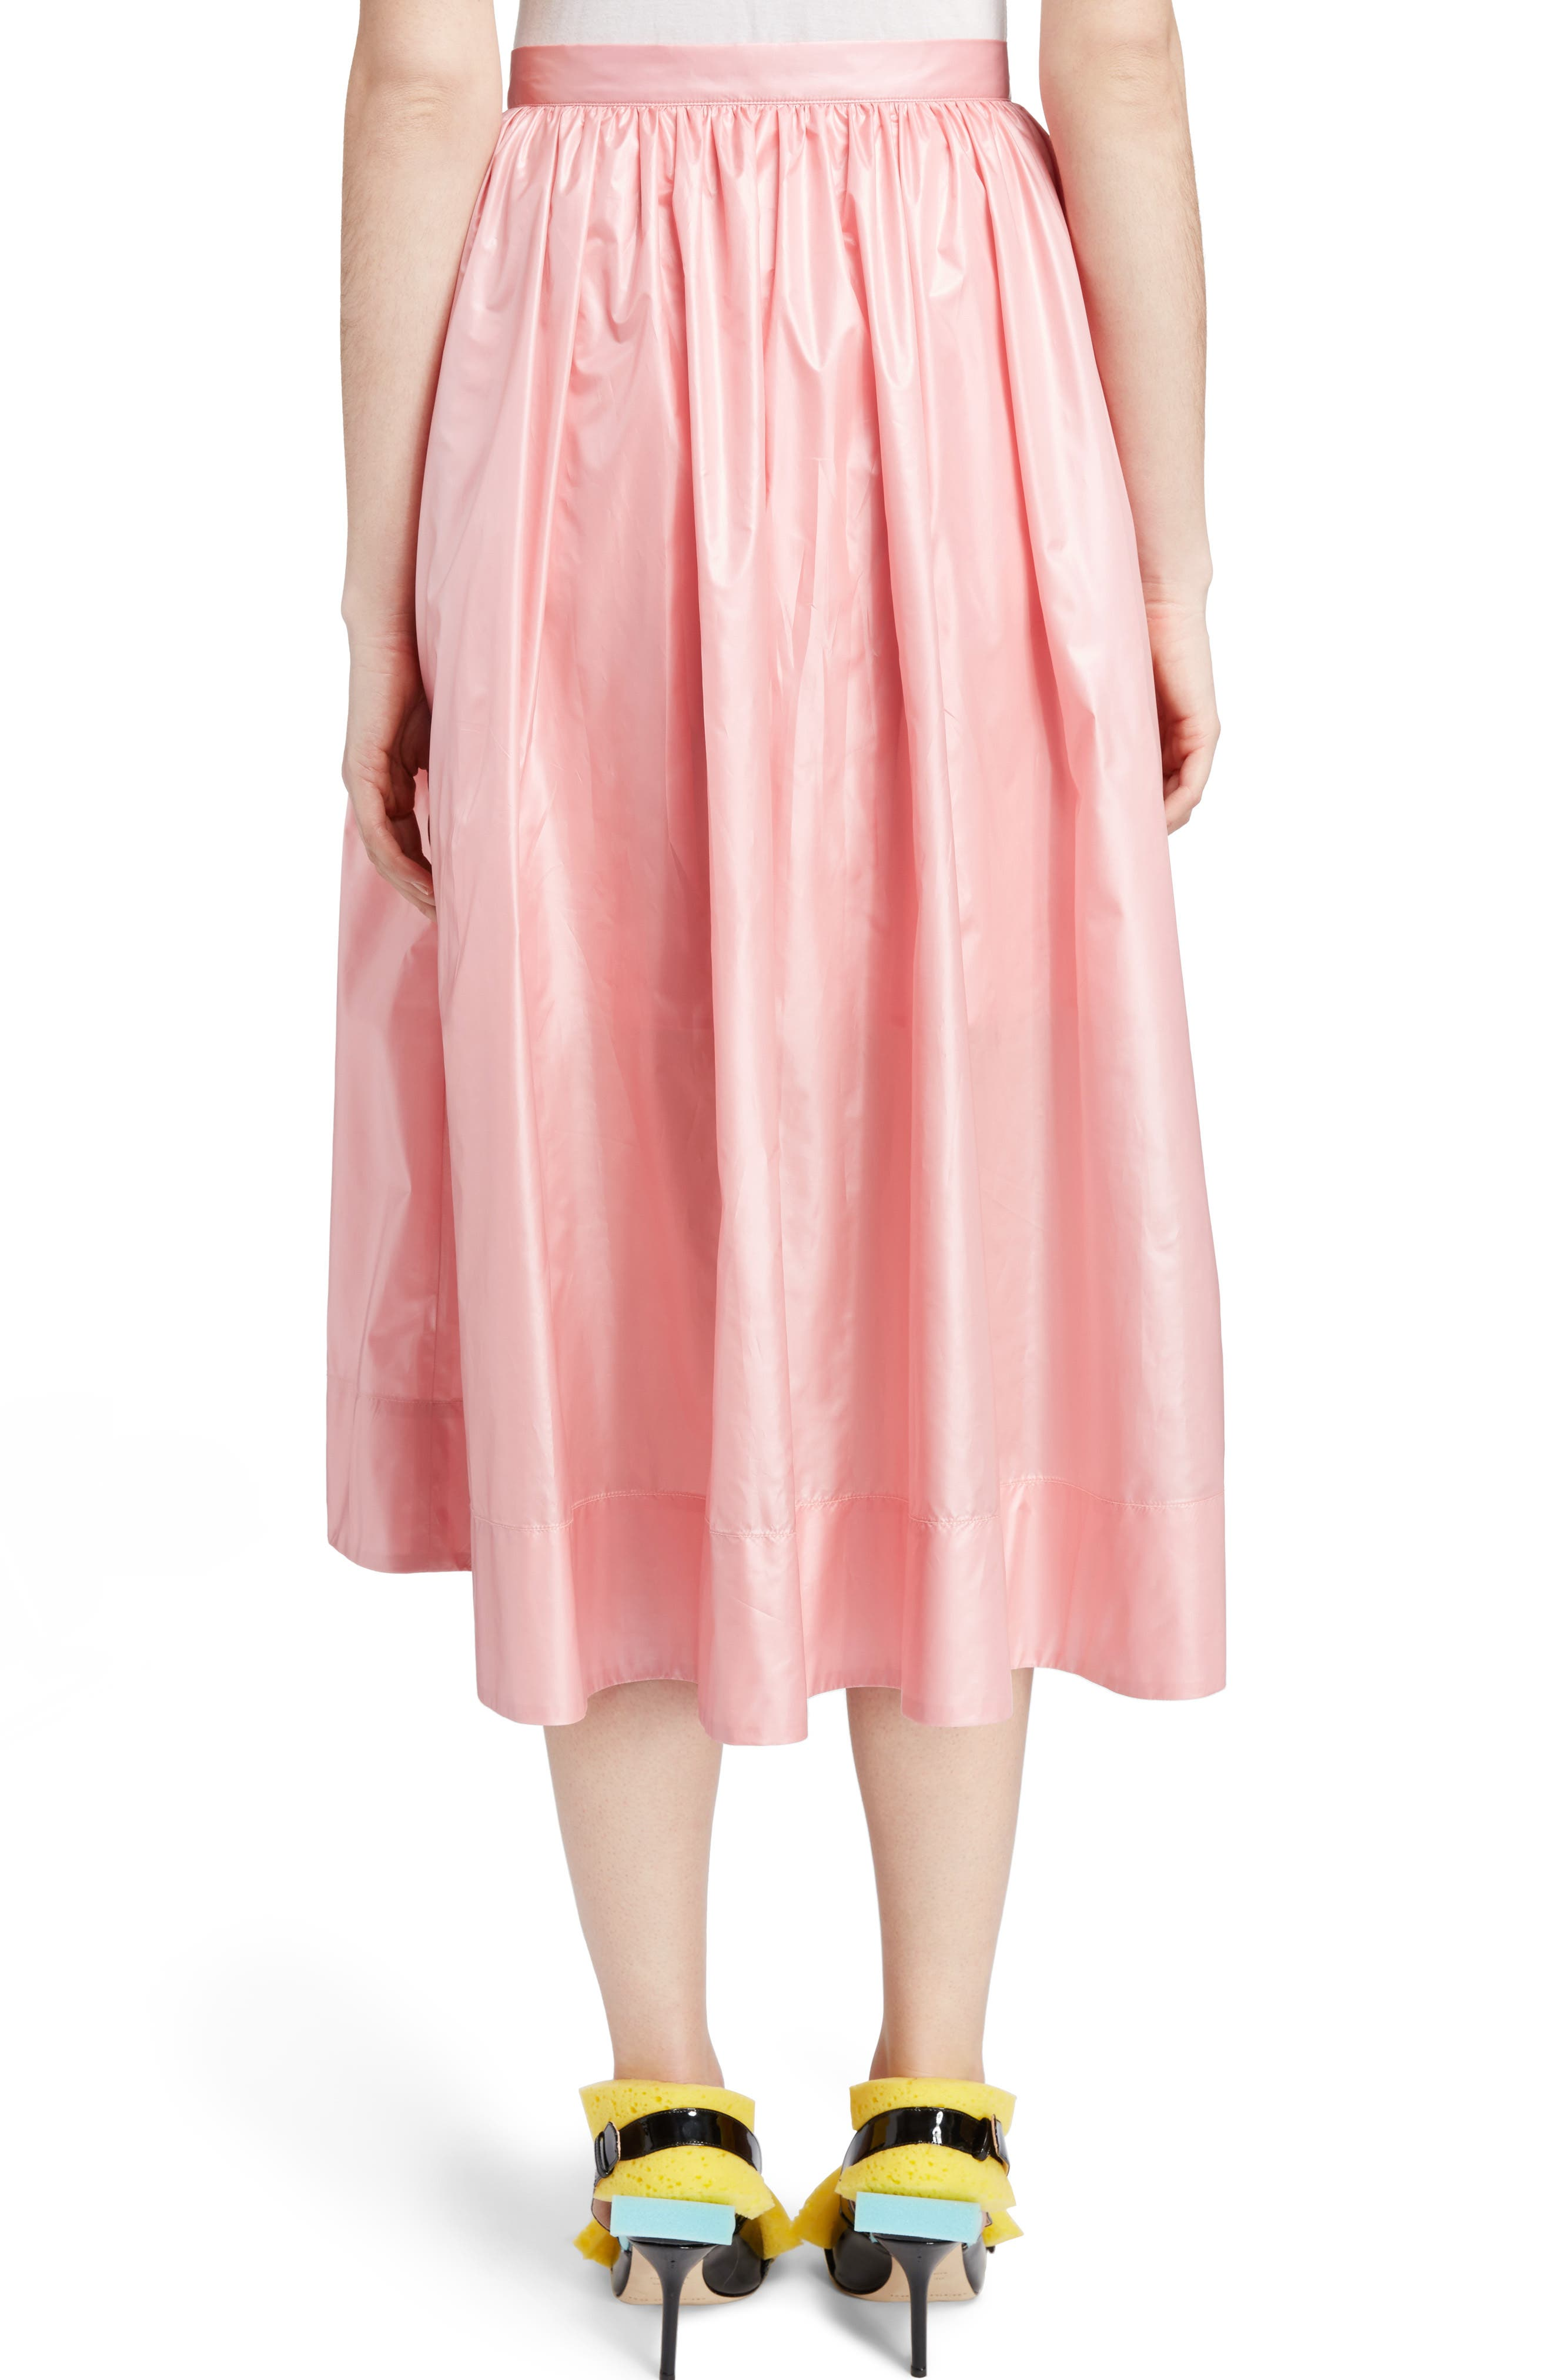 Nylon Parachute Skirt,                             Alternate thumbnail 2, color,                             650